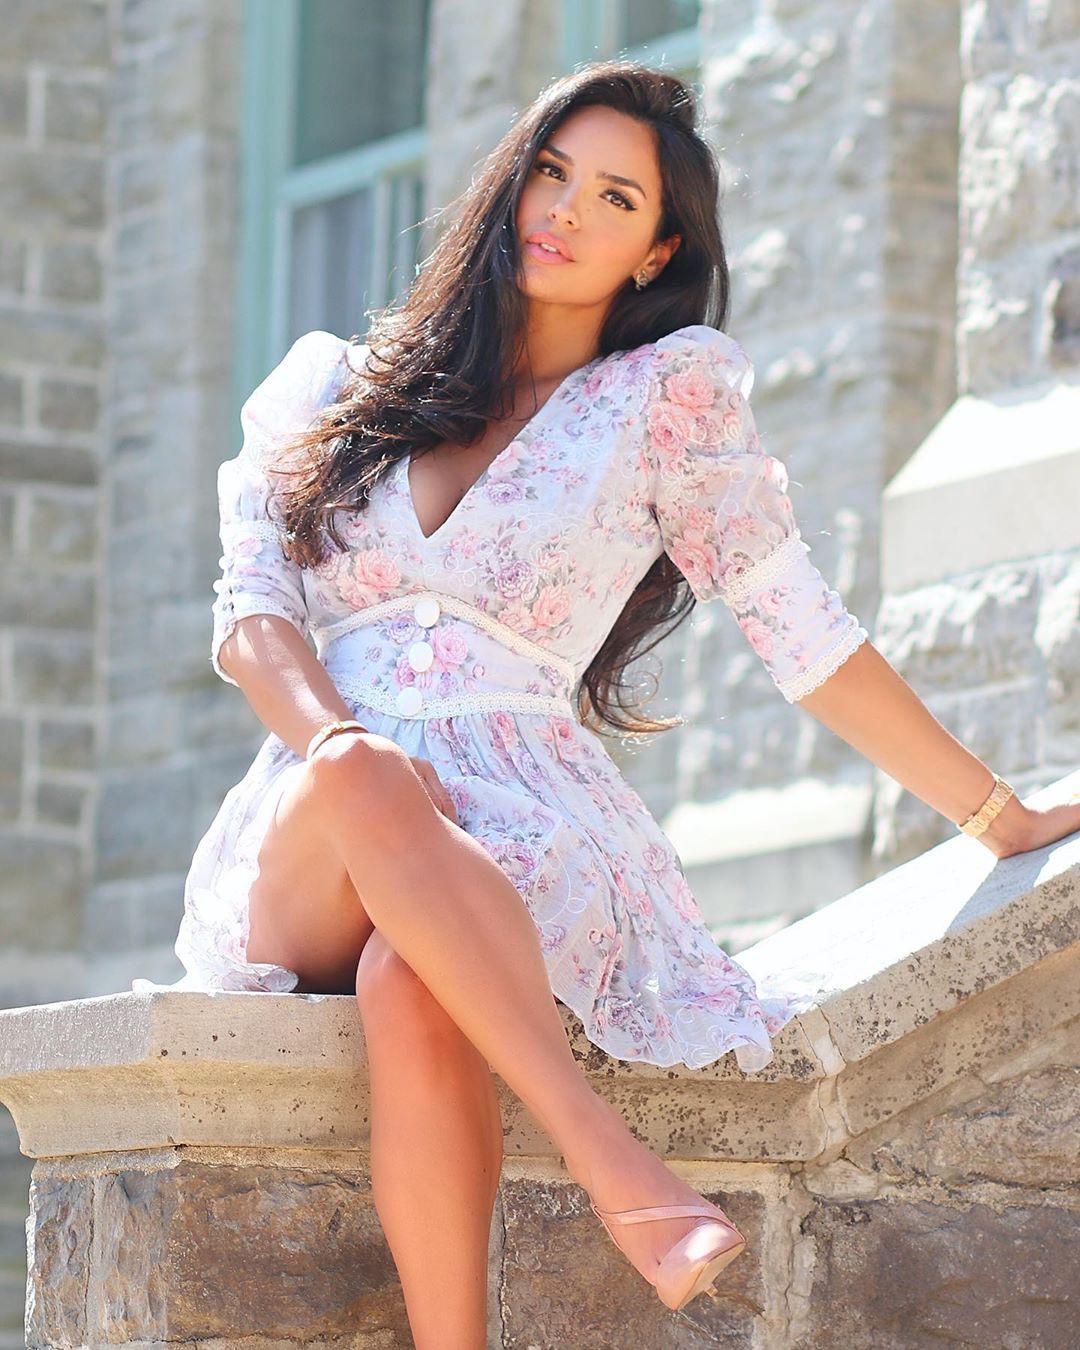 Shadi Y Cair girls photoshoot, hot girls thighs, legs pic